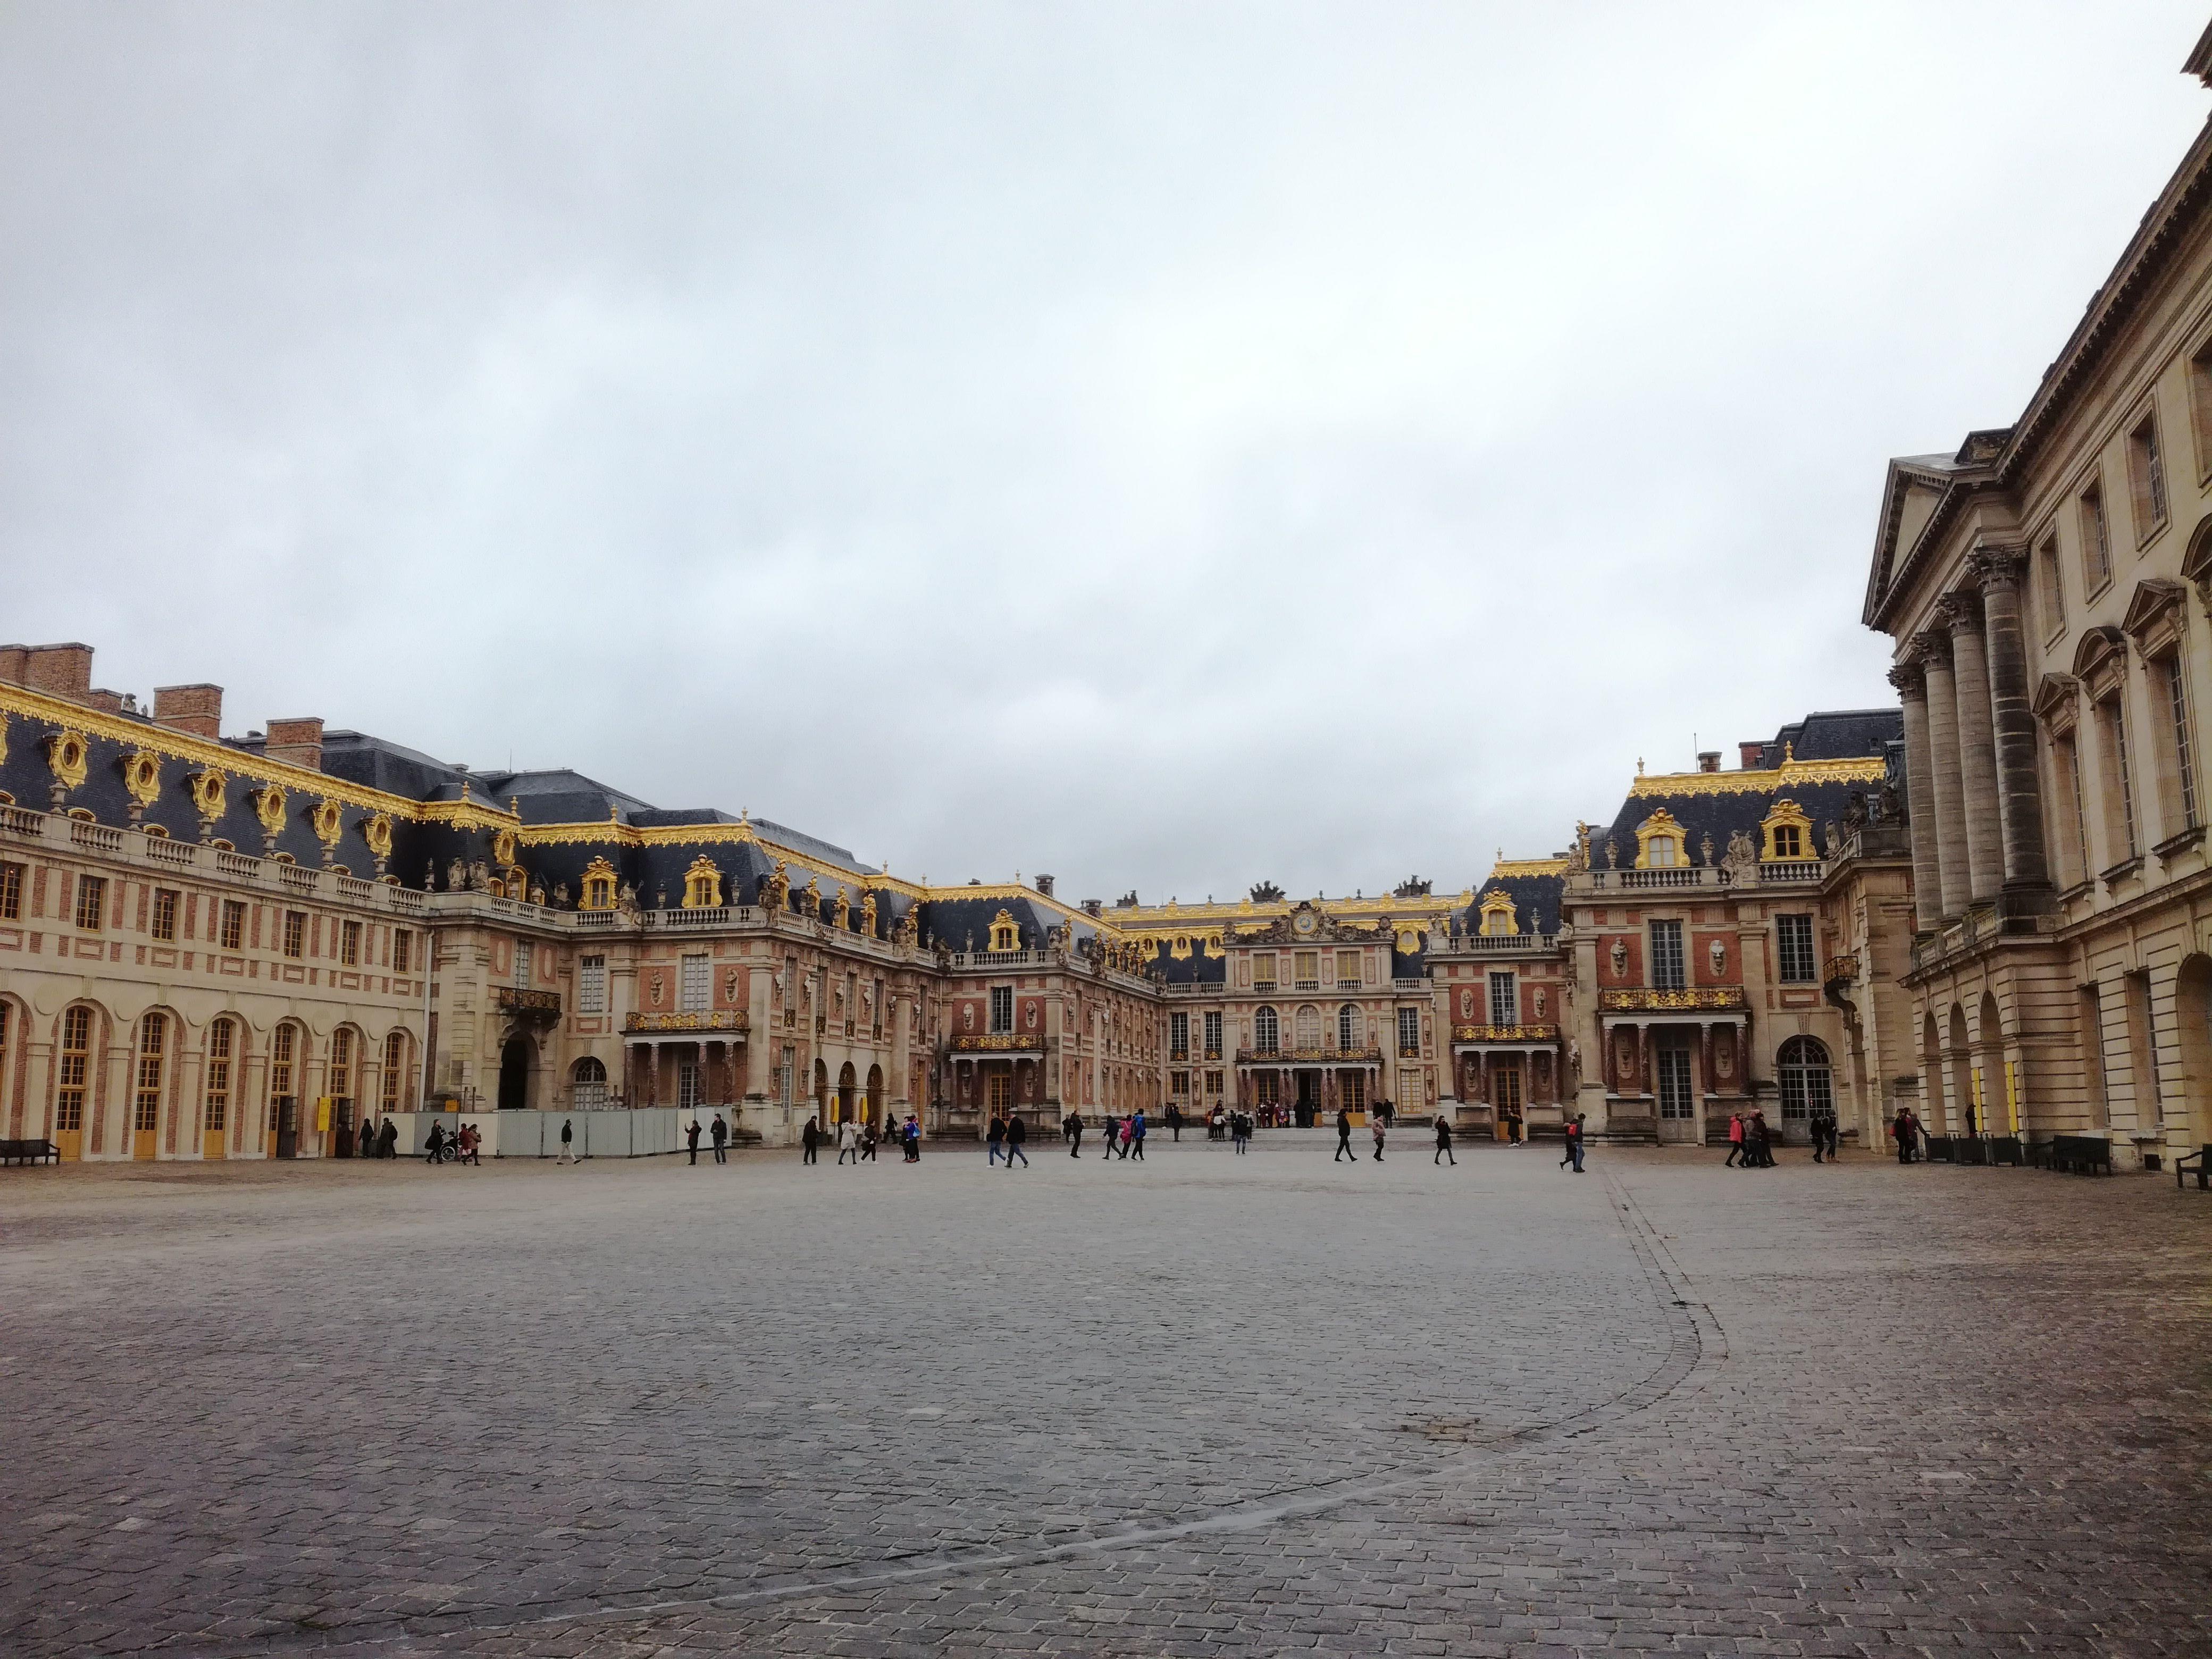 Courtyard of Versailles